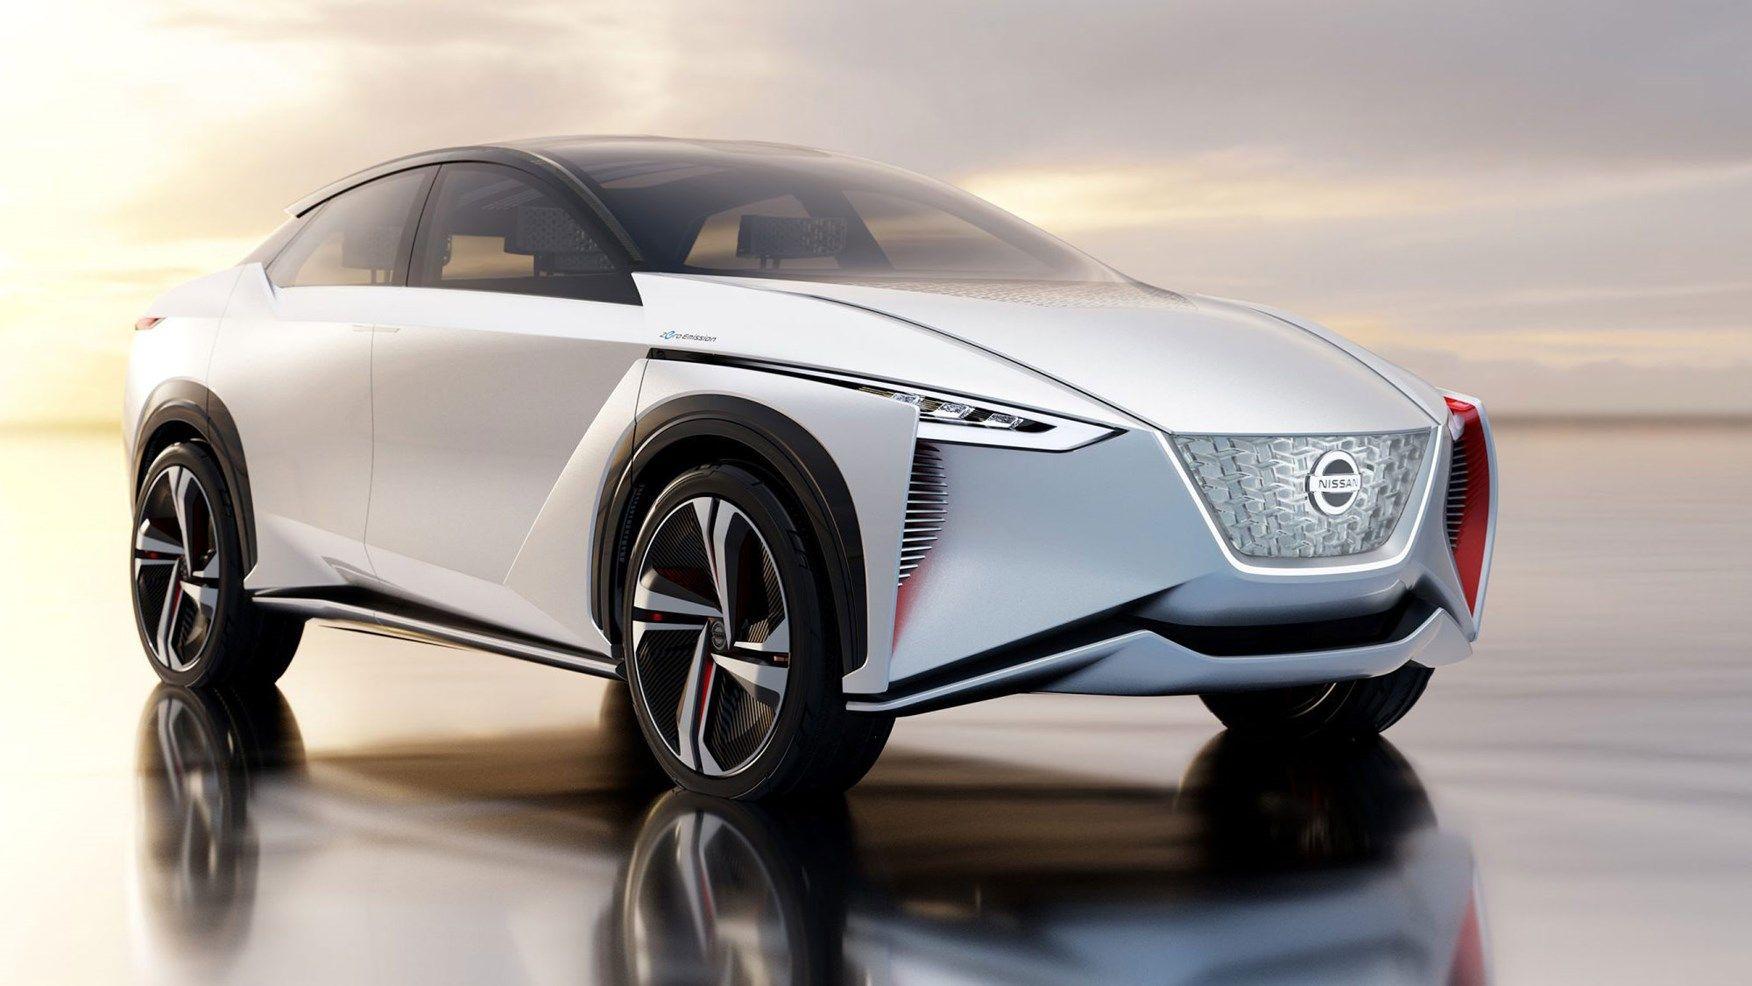 Pin by Dariniel De Jesús Reyes on My cars dreams in 2020